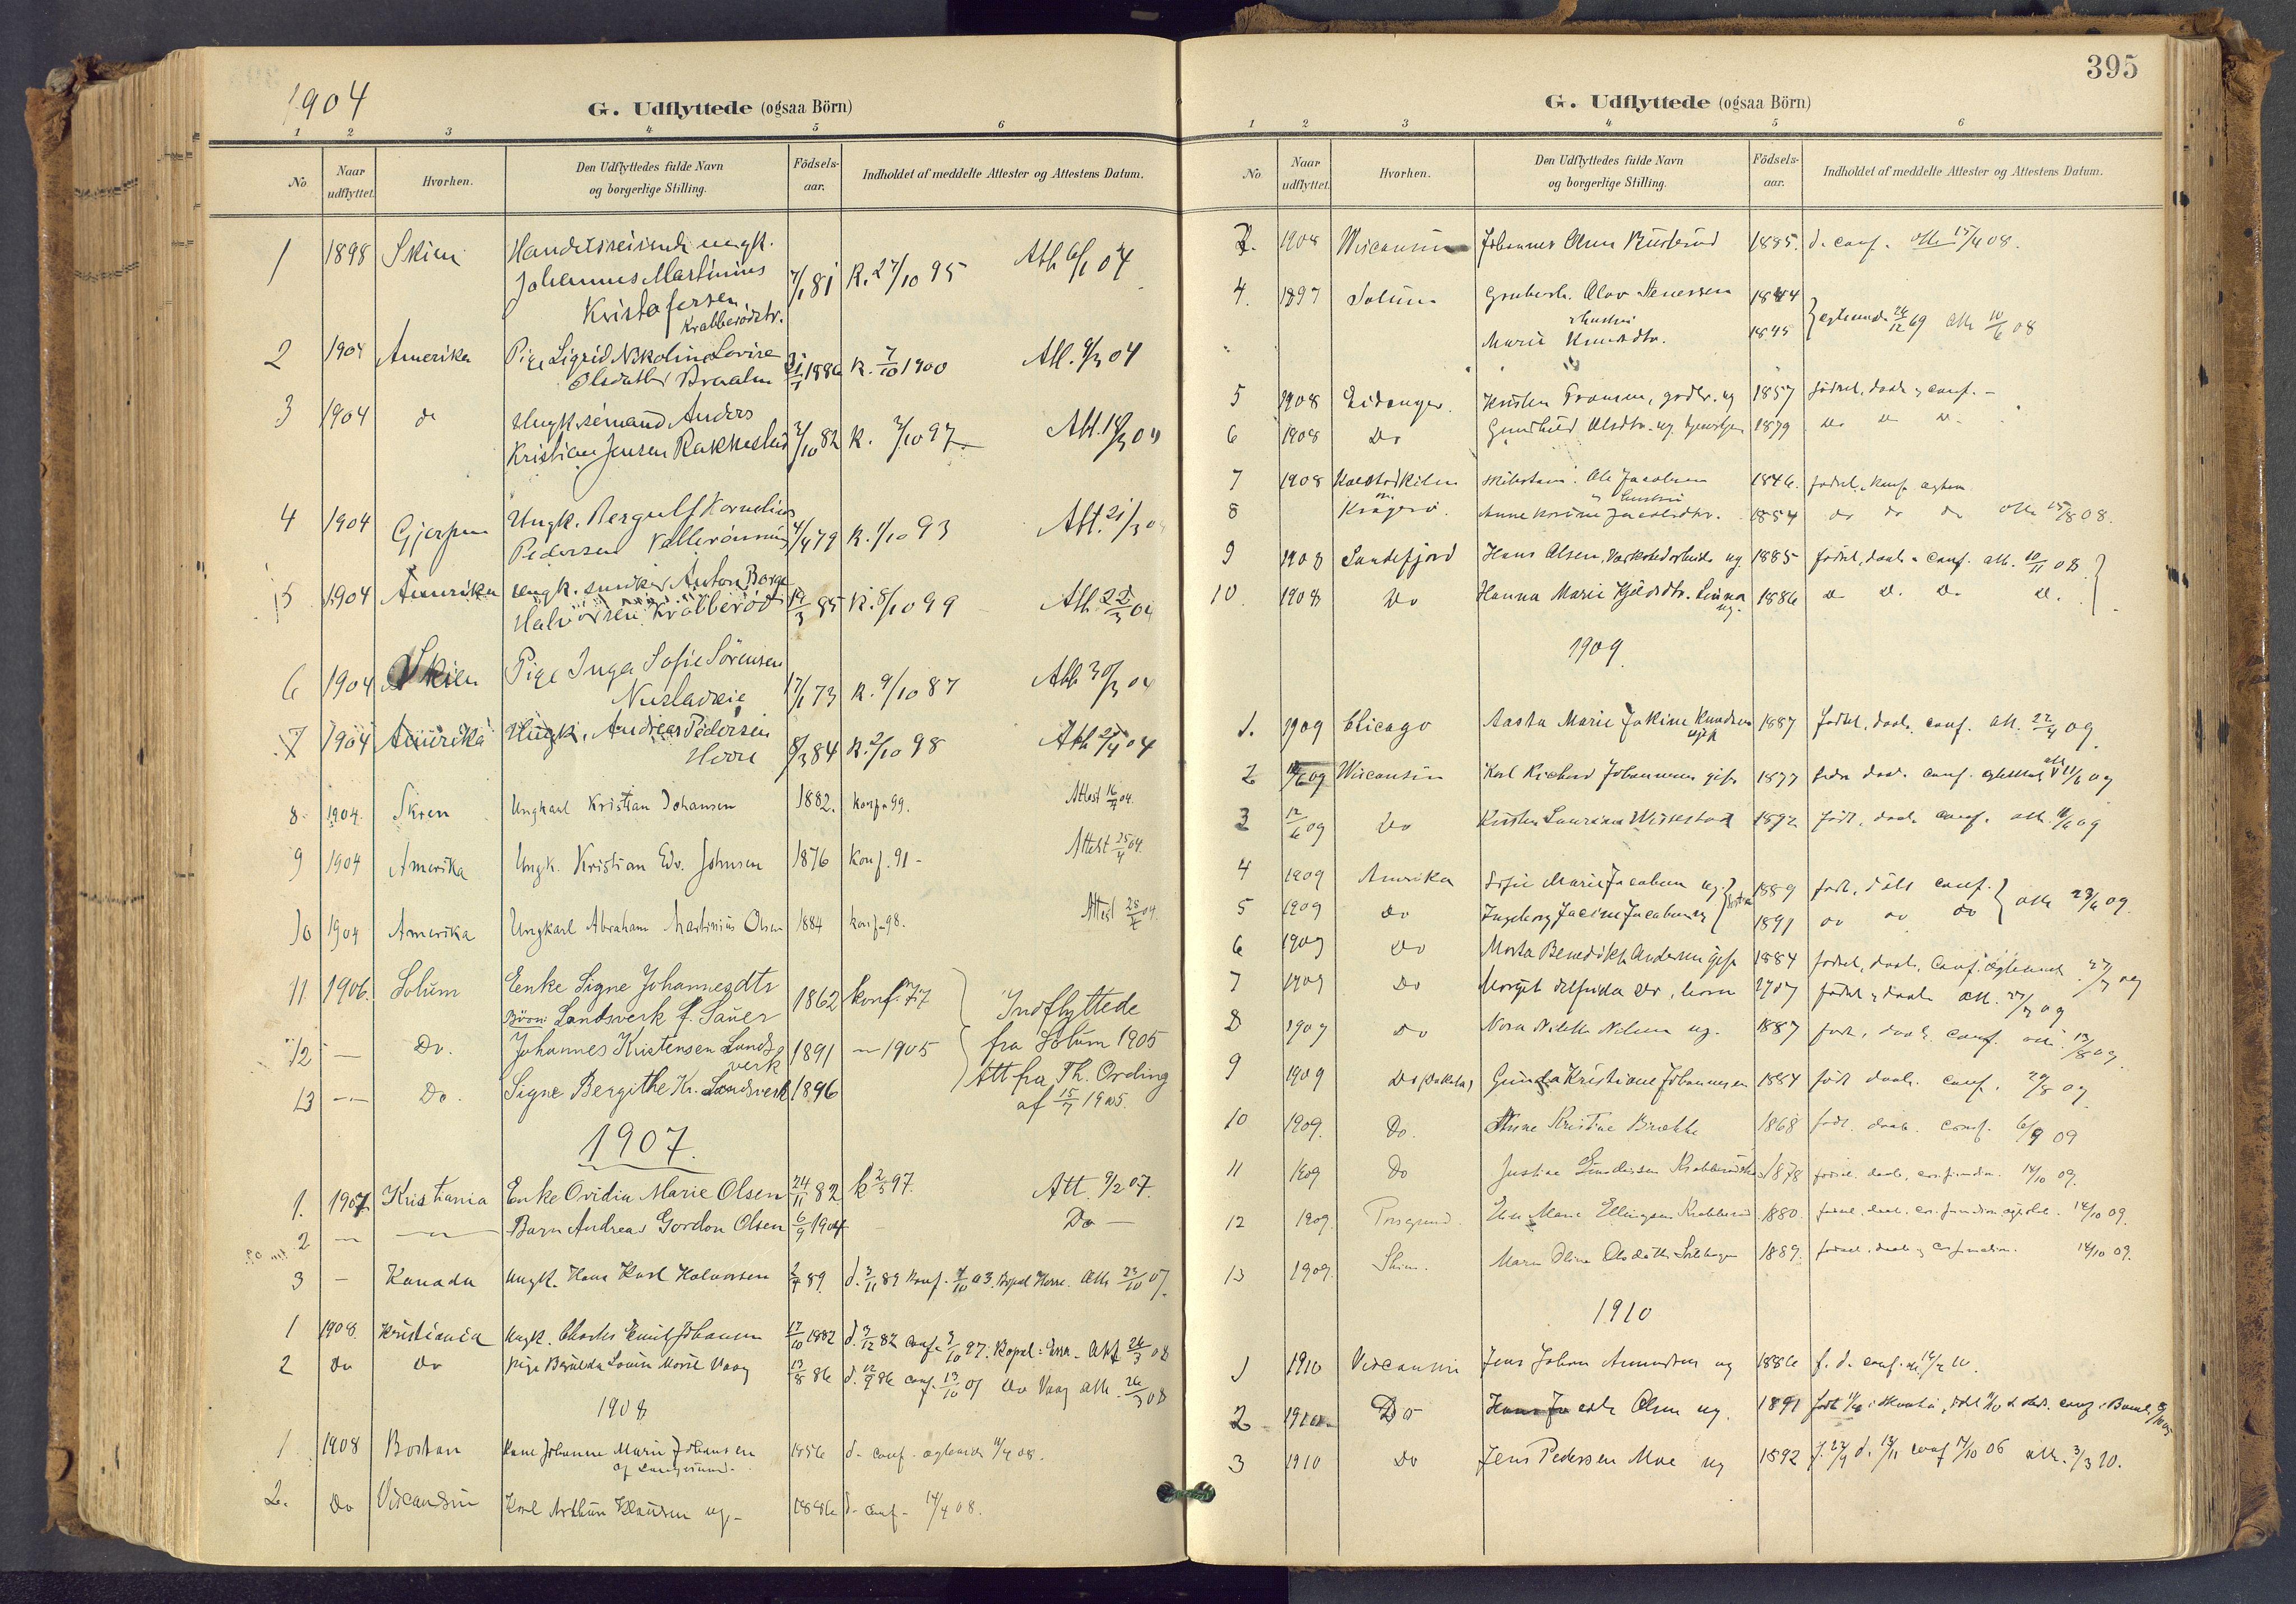 SAKO, Bamble kirkebøker, F/Fa/L0009: Ministerialbok nr. I 9, 1901-1917, s. 395